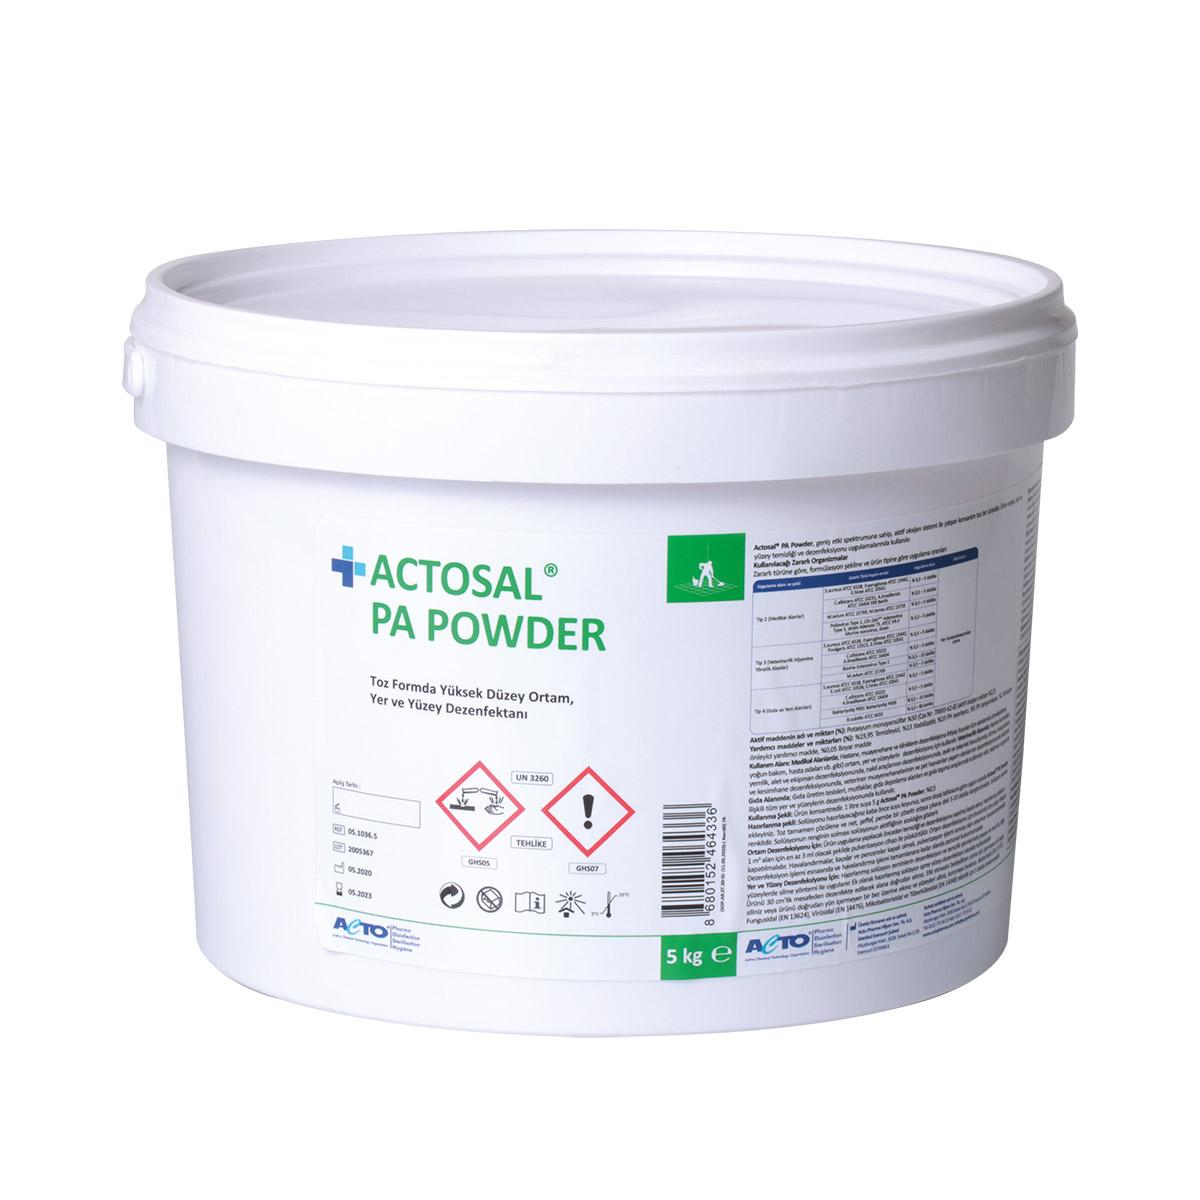 Actosal PA Powder 5 kg